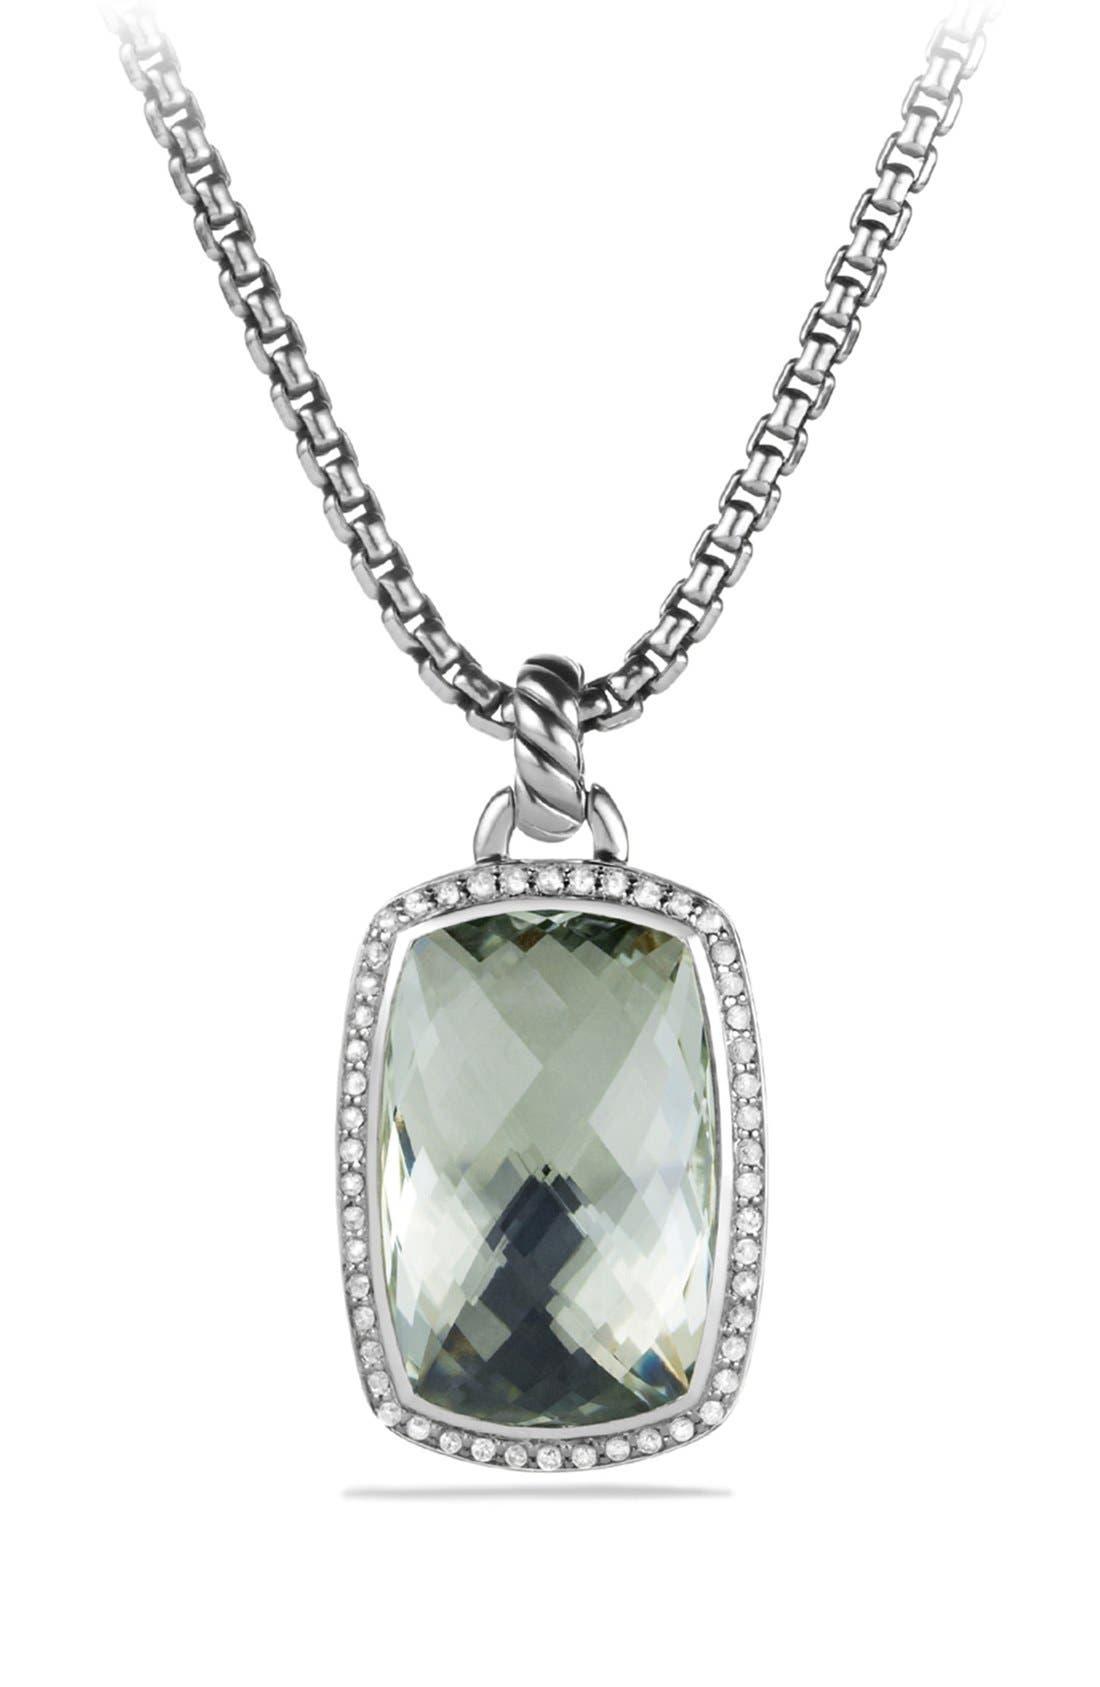 DAVID YURMAN 'Albion' Pendant with Semiprecious Stone and